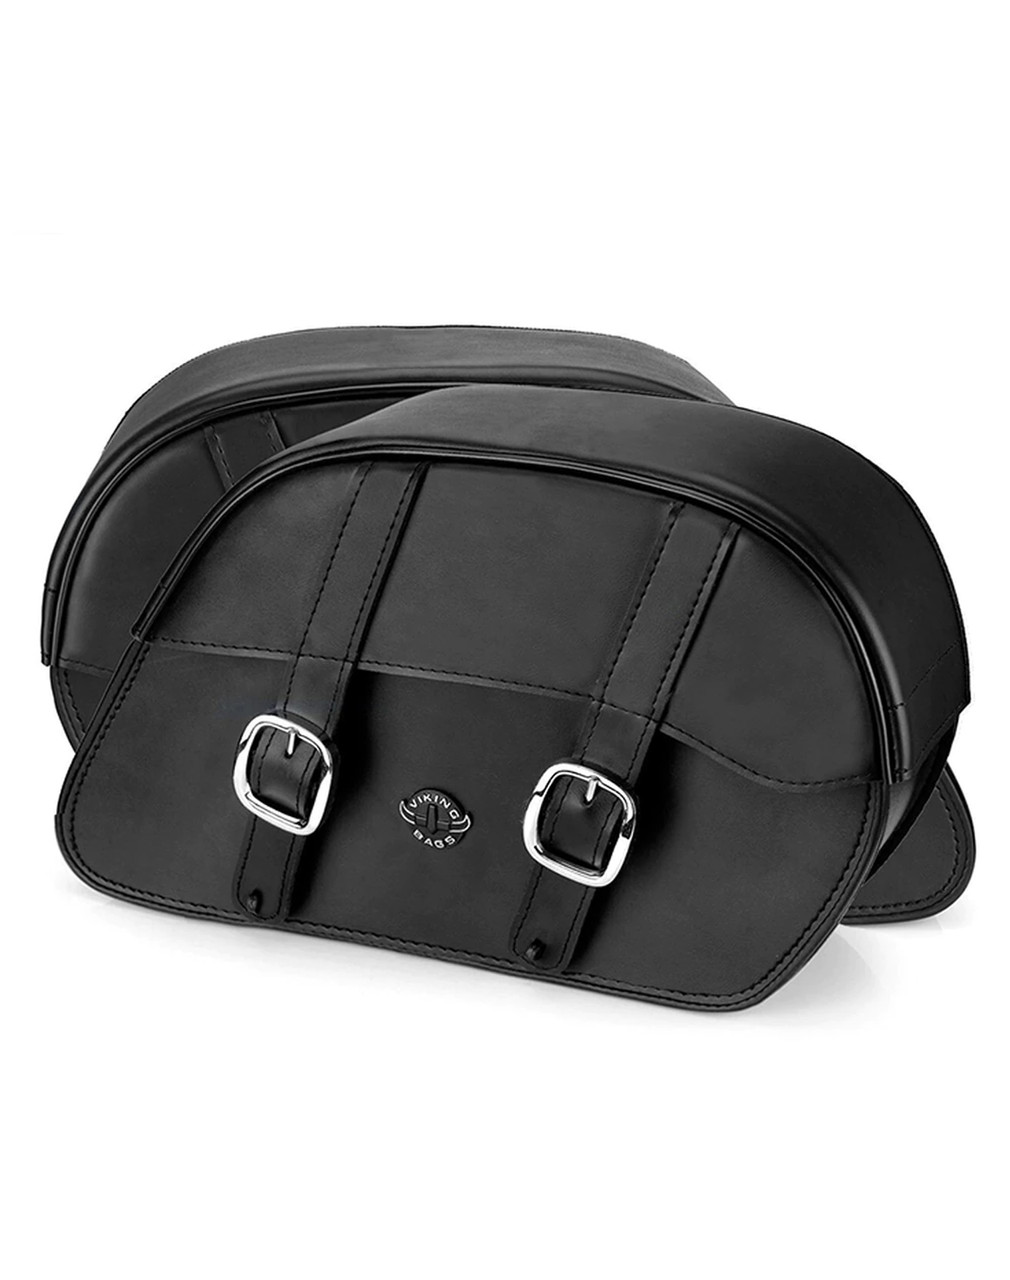 VikingBags Vital Large Padlock Double Strap Leather Motorcycle Saddlebags Both Bags View